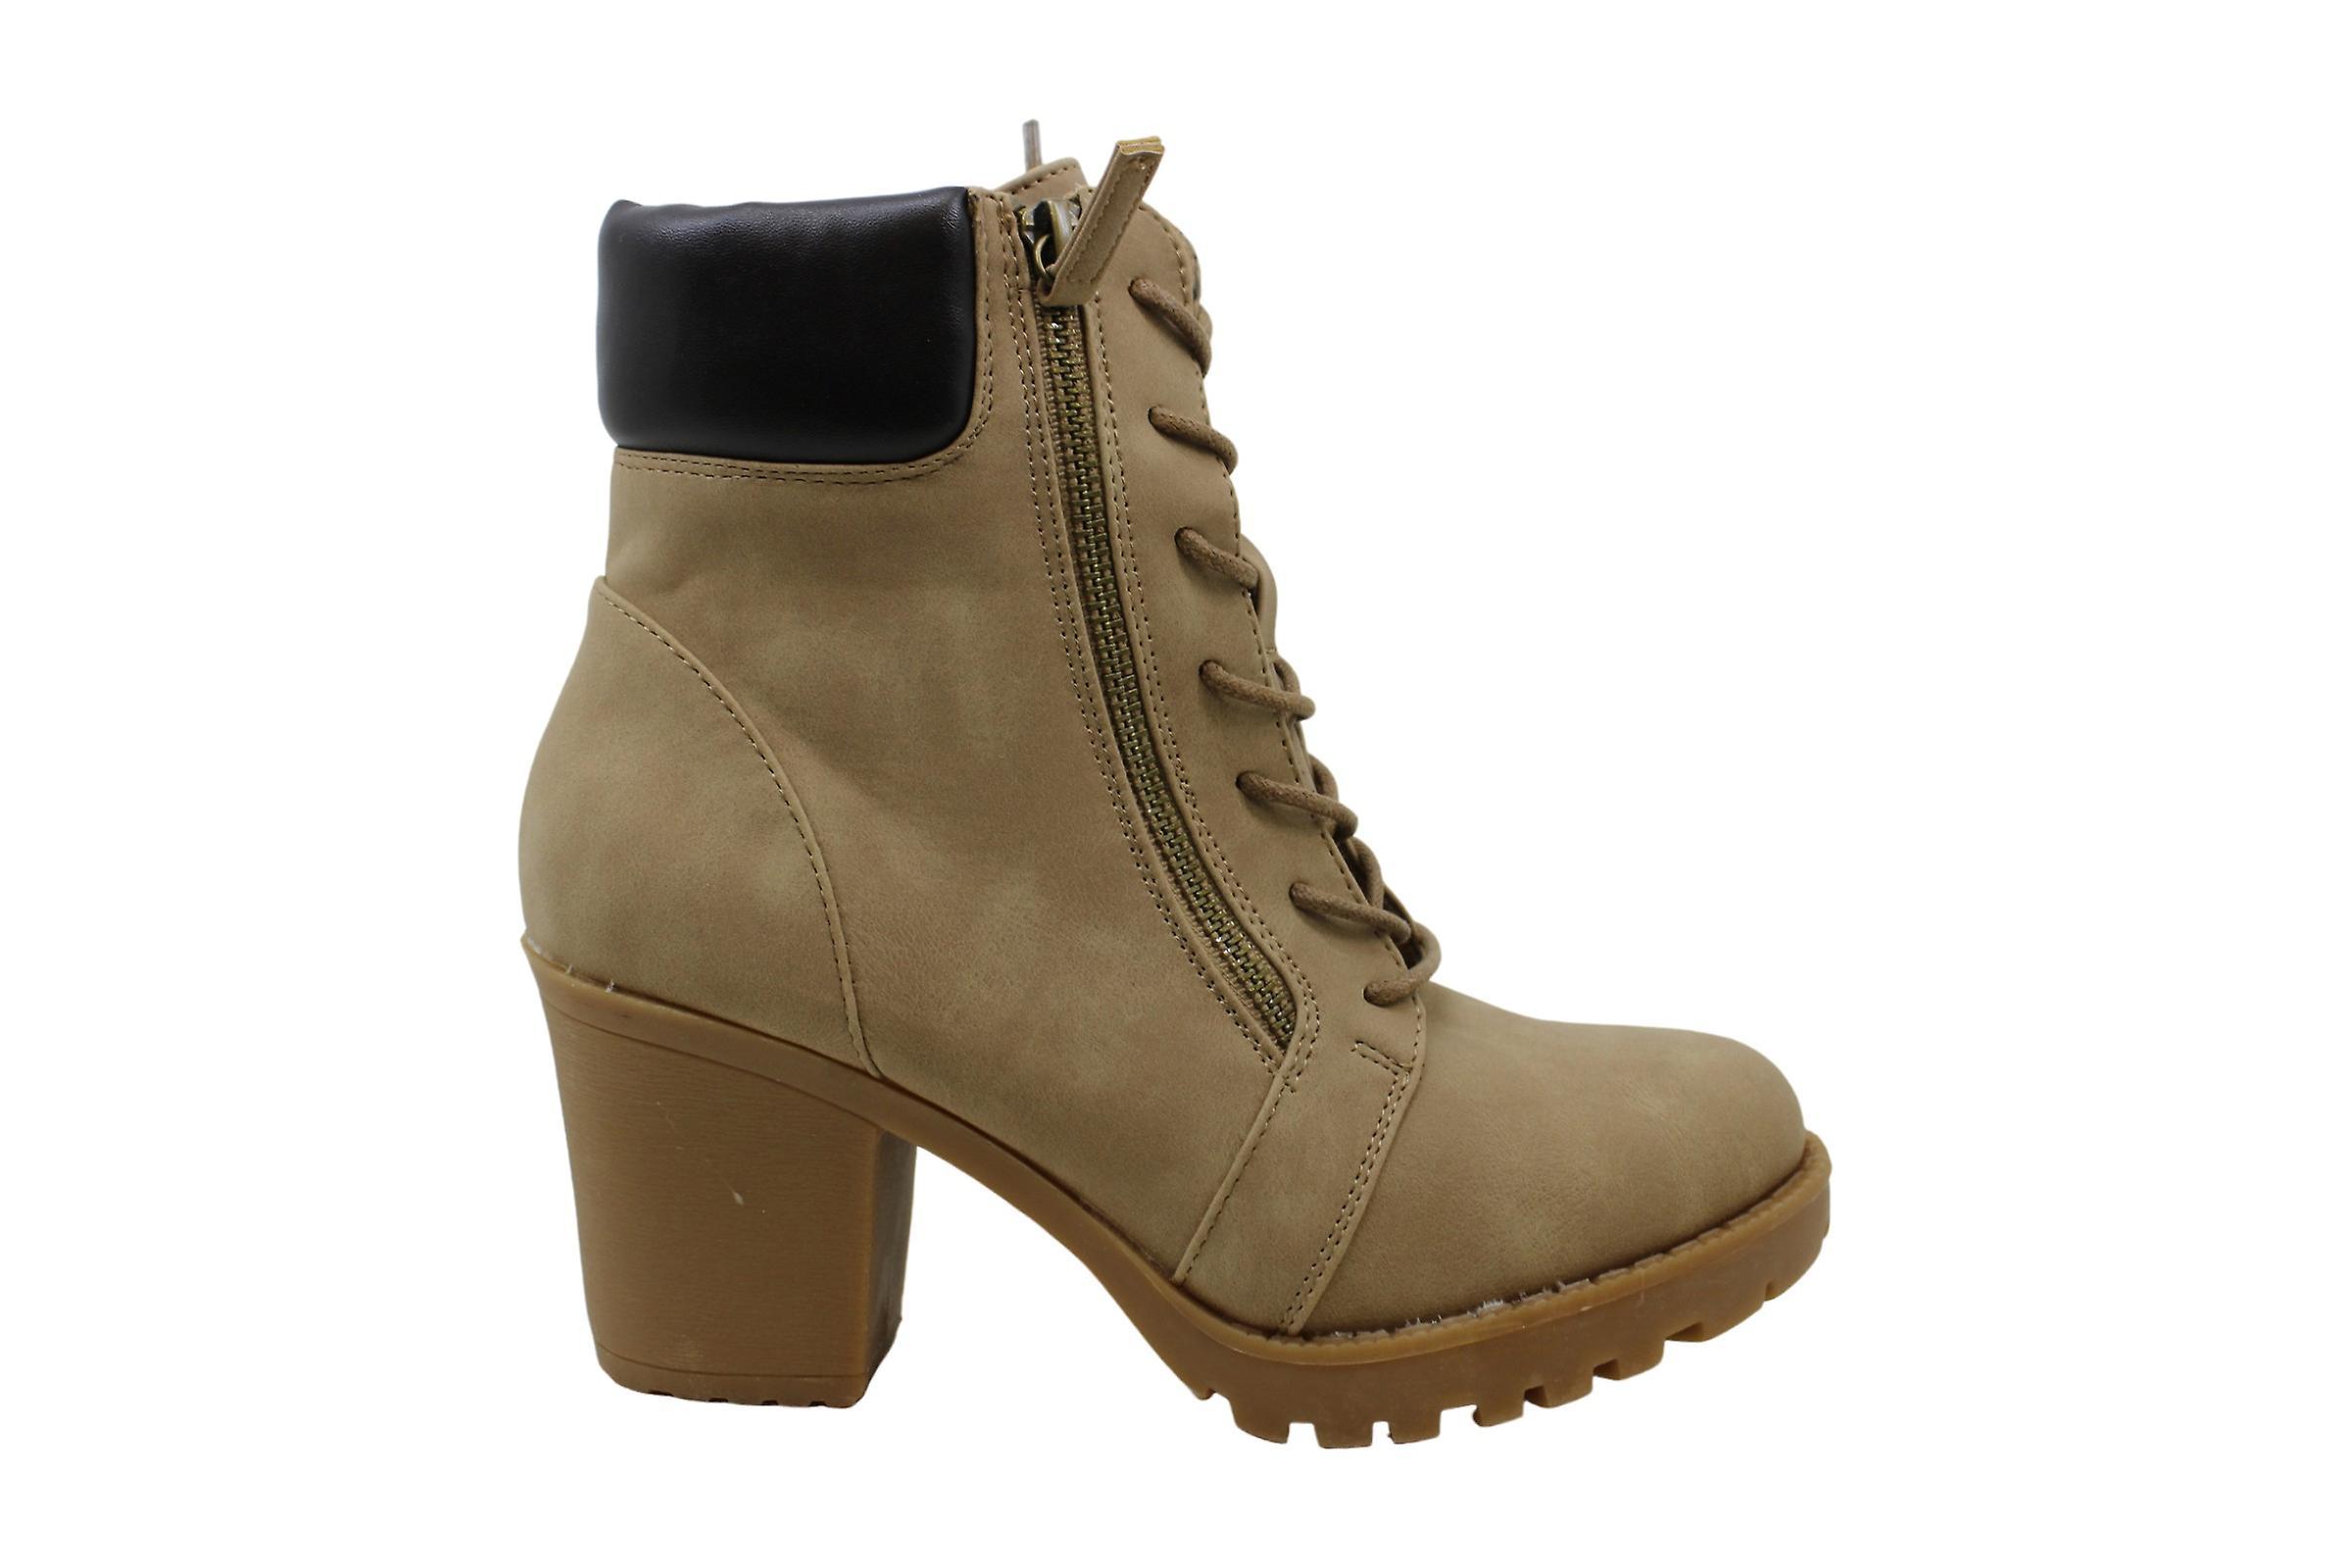 ZIGI SOHO Kayne Kobiety's Boot 8 B(M) US Wheat-Dark Brown svLx6